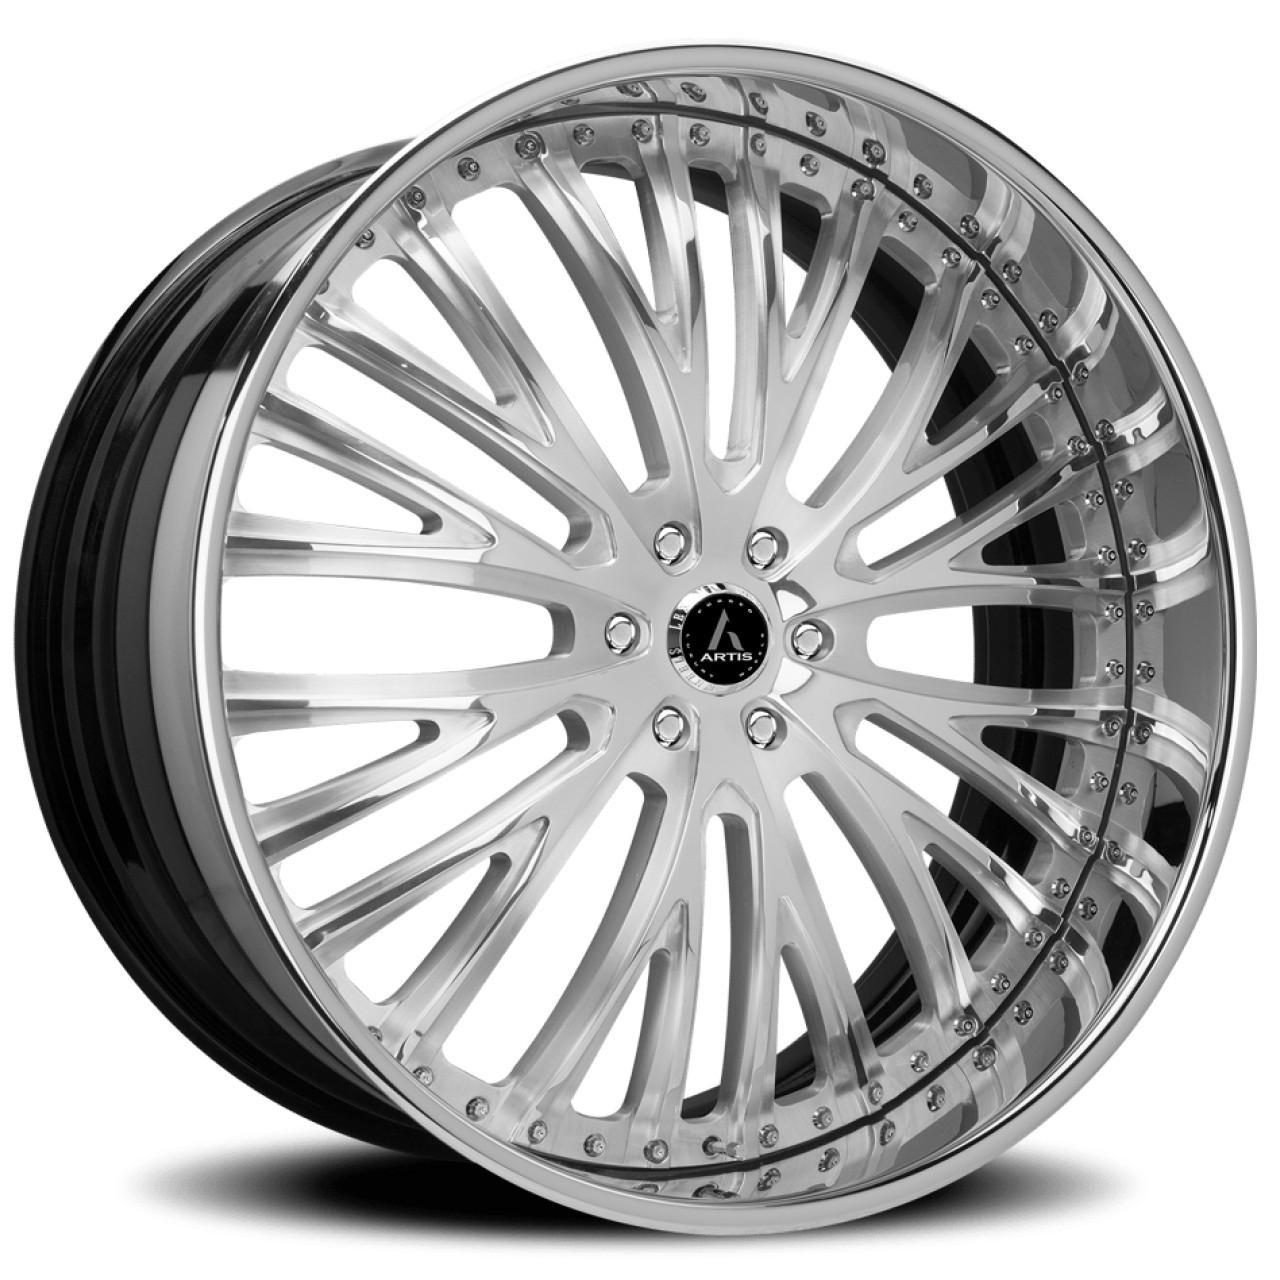 Artis Woodward forged wheels